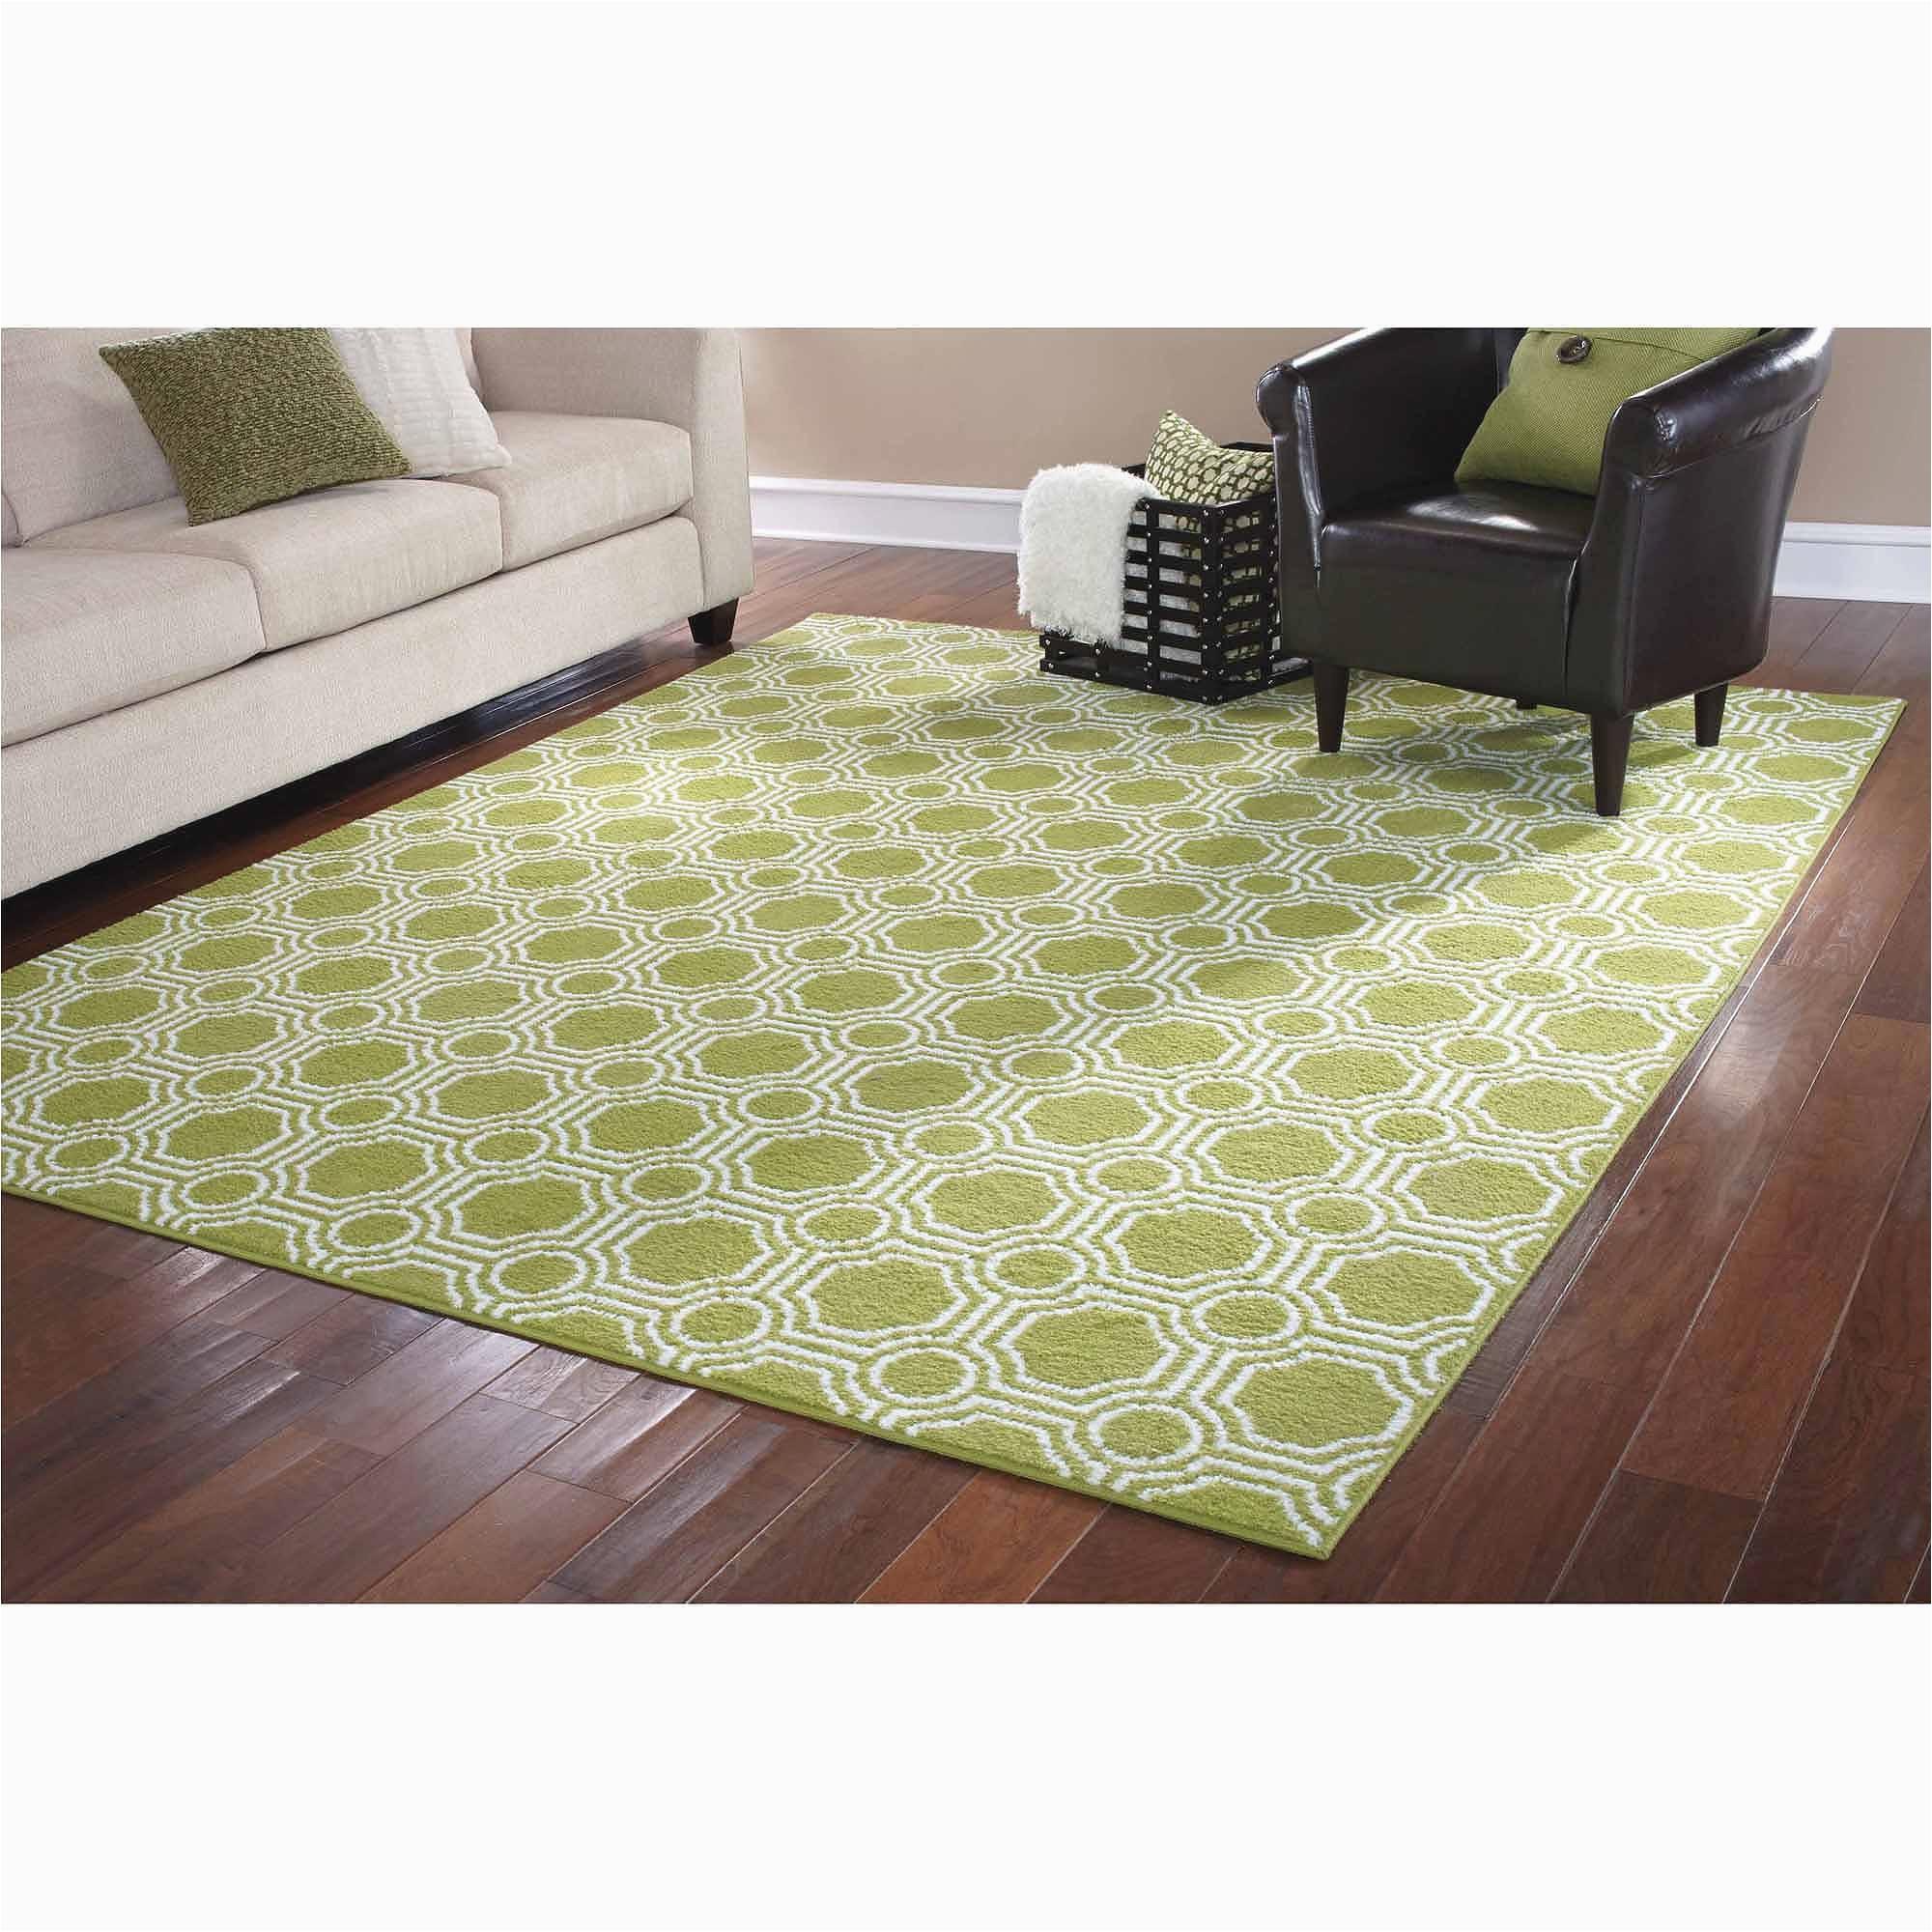 floor cheap outdoor rugs 8x10 splendid outdoor area rugs 8x10 lovely rugs green rug runner